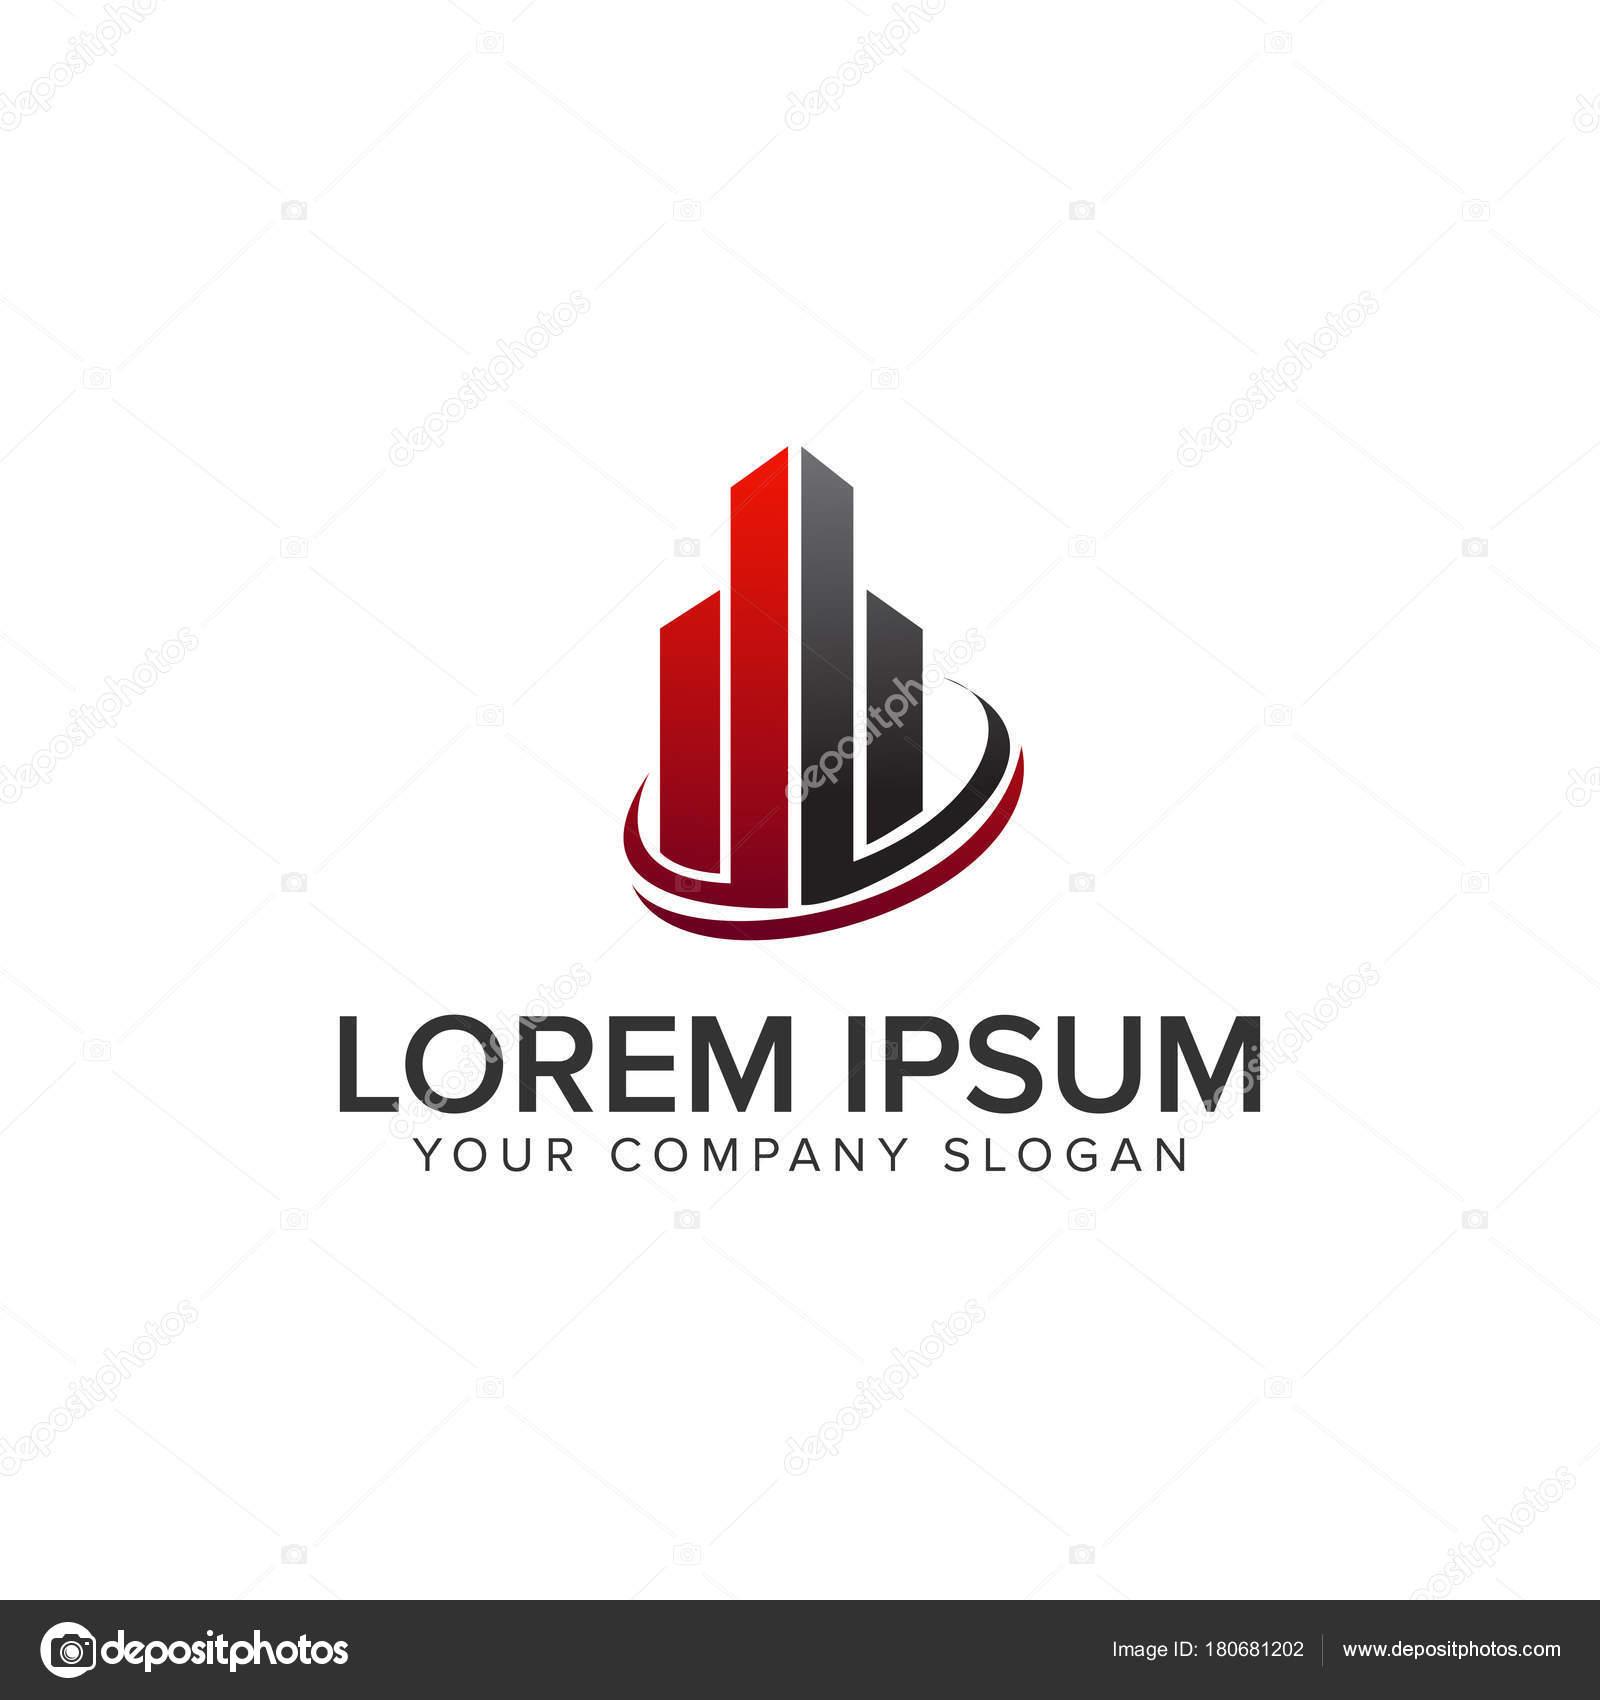 Construction Company Logo Design Templates Kaser Vtngcf Org